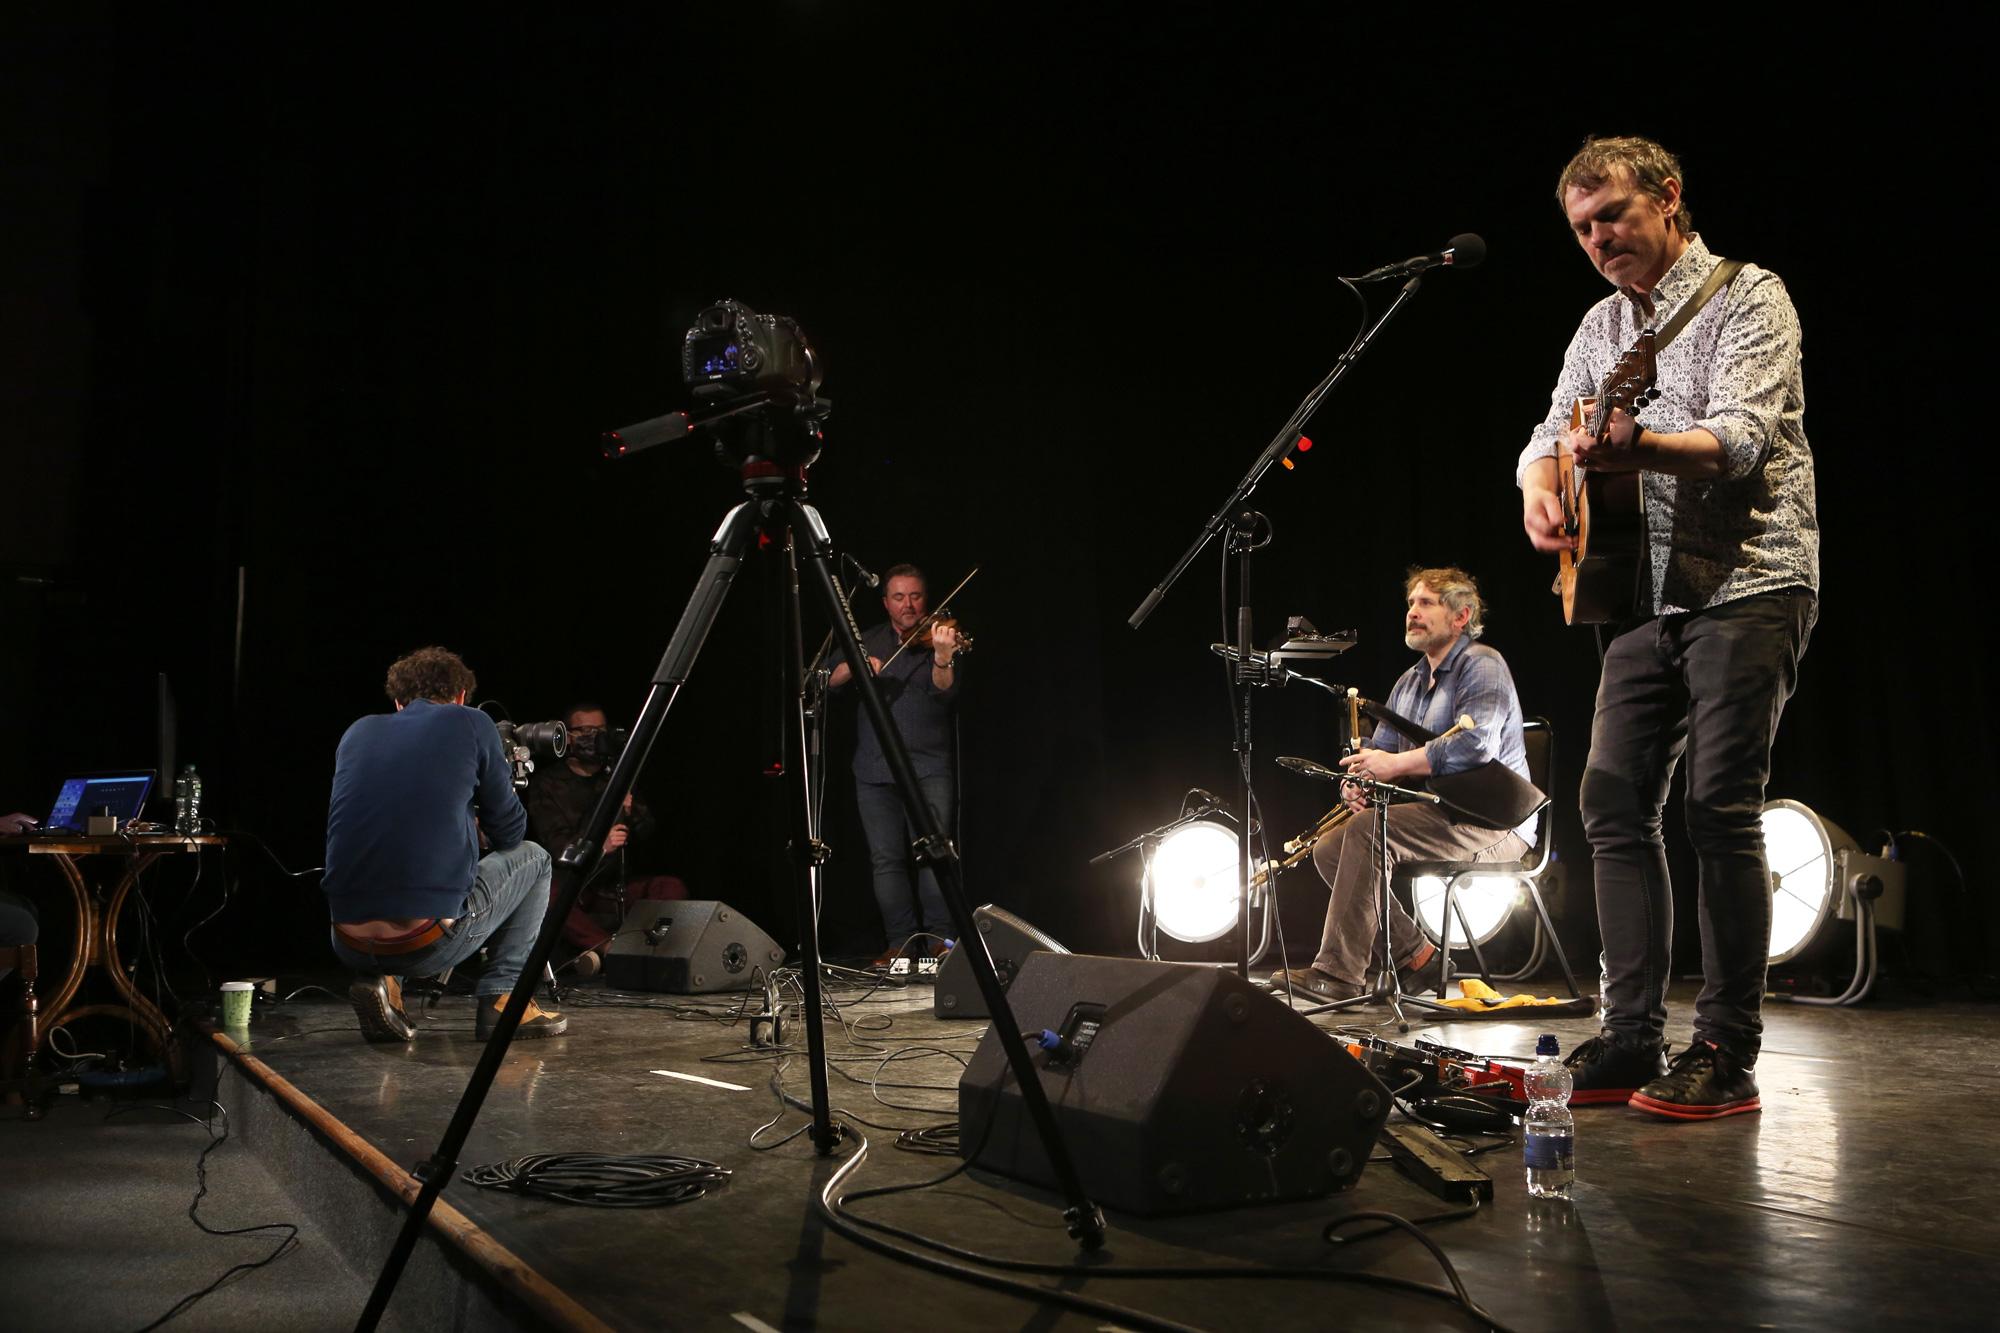 Droichead Arts Centre Online Concerts, Jenny Callanan Photography, Drogheda, Co.Louth